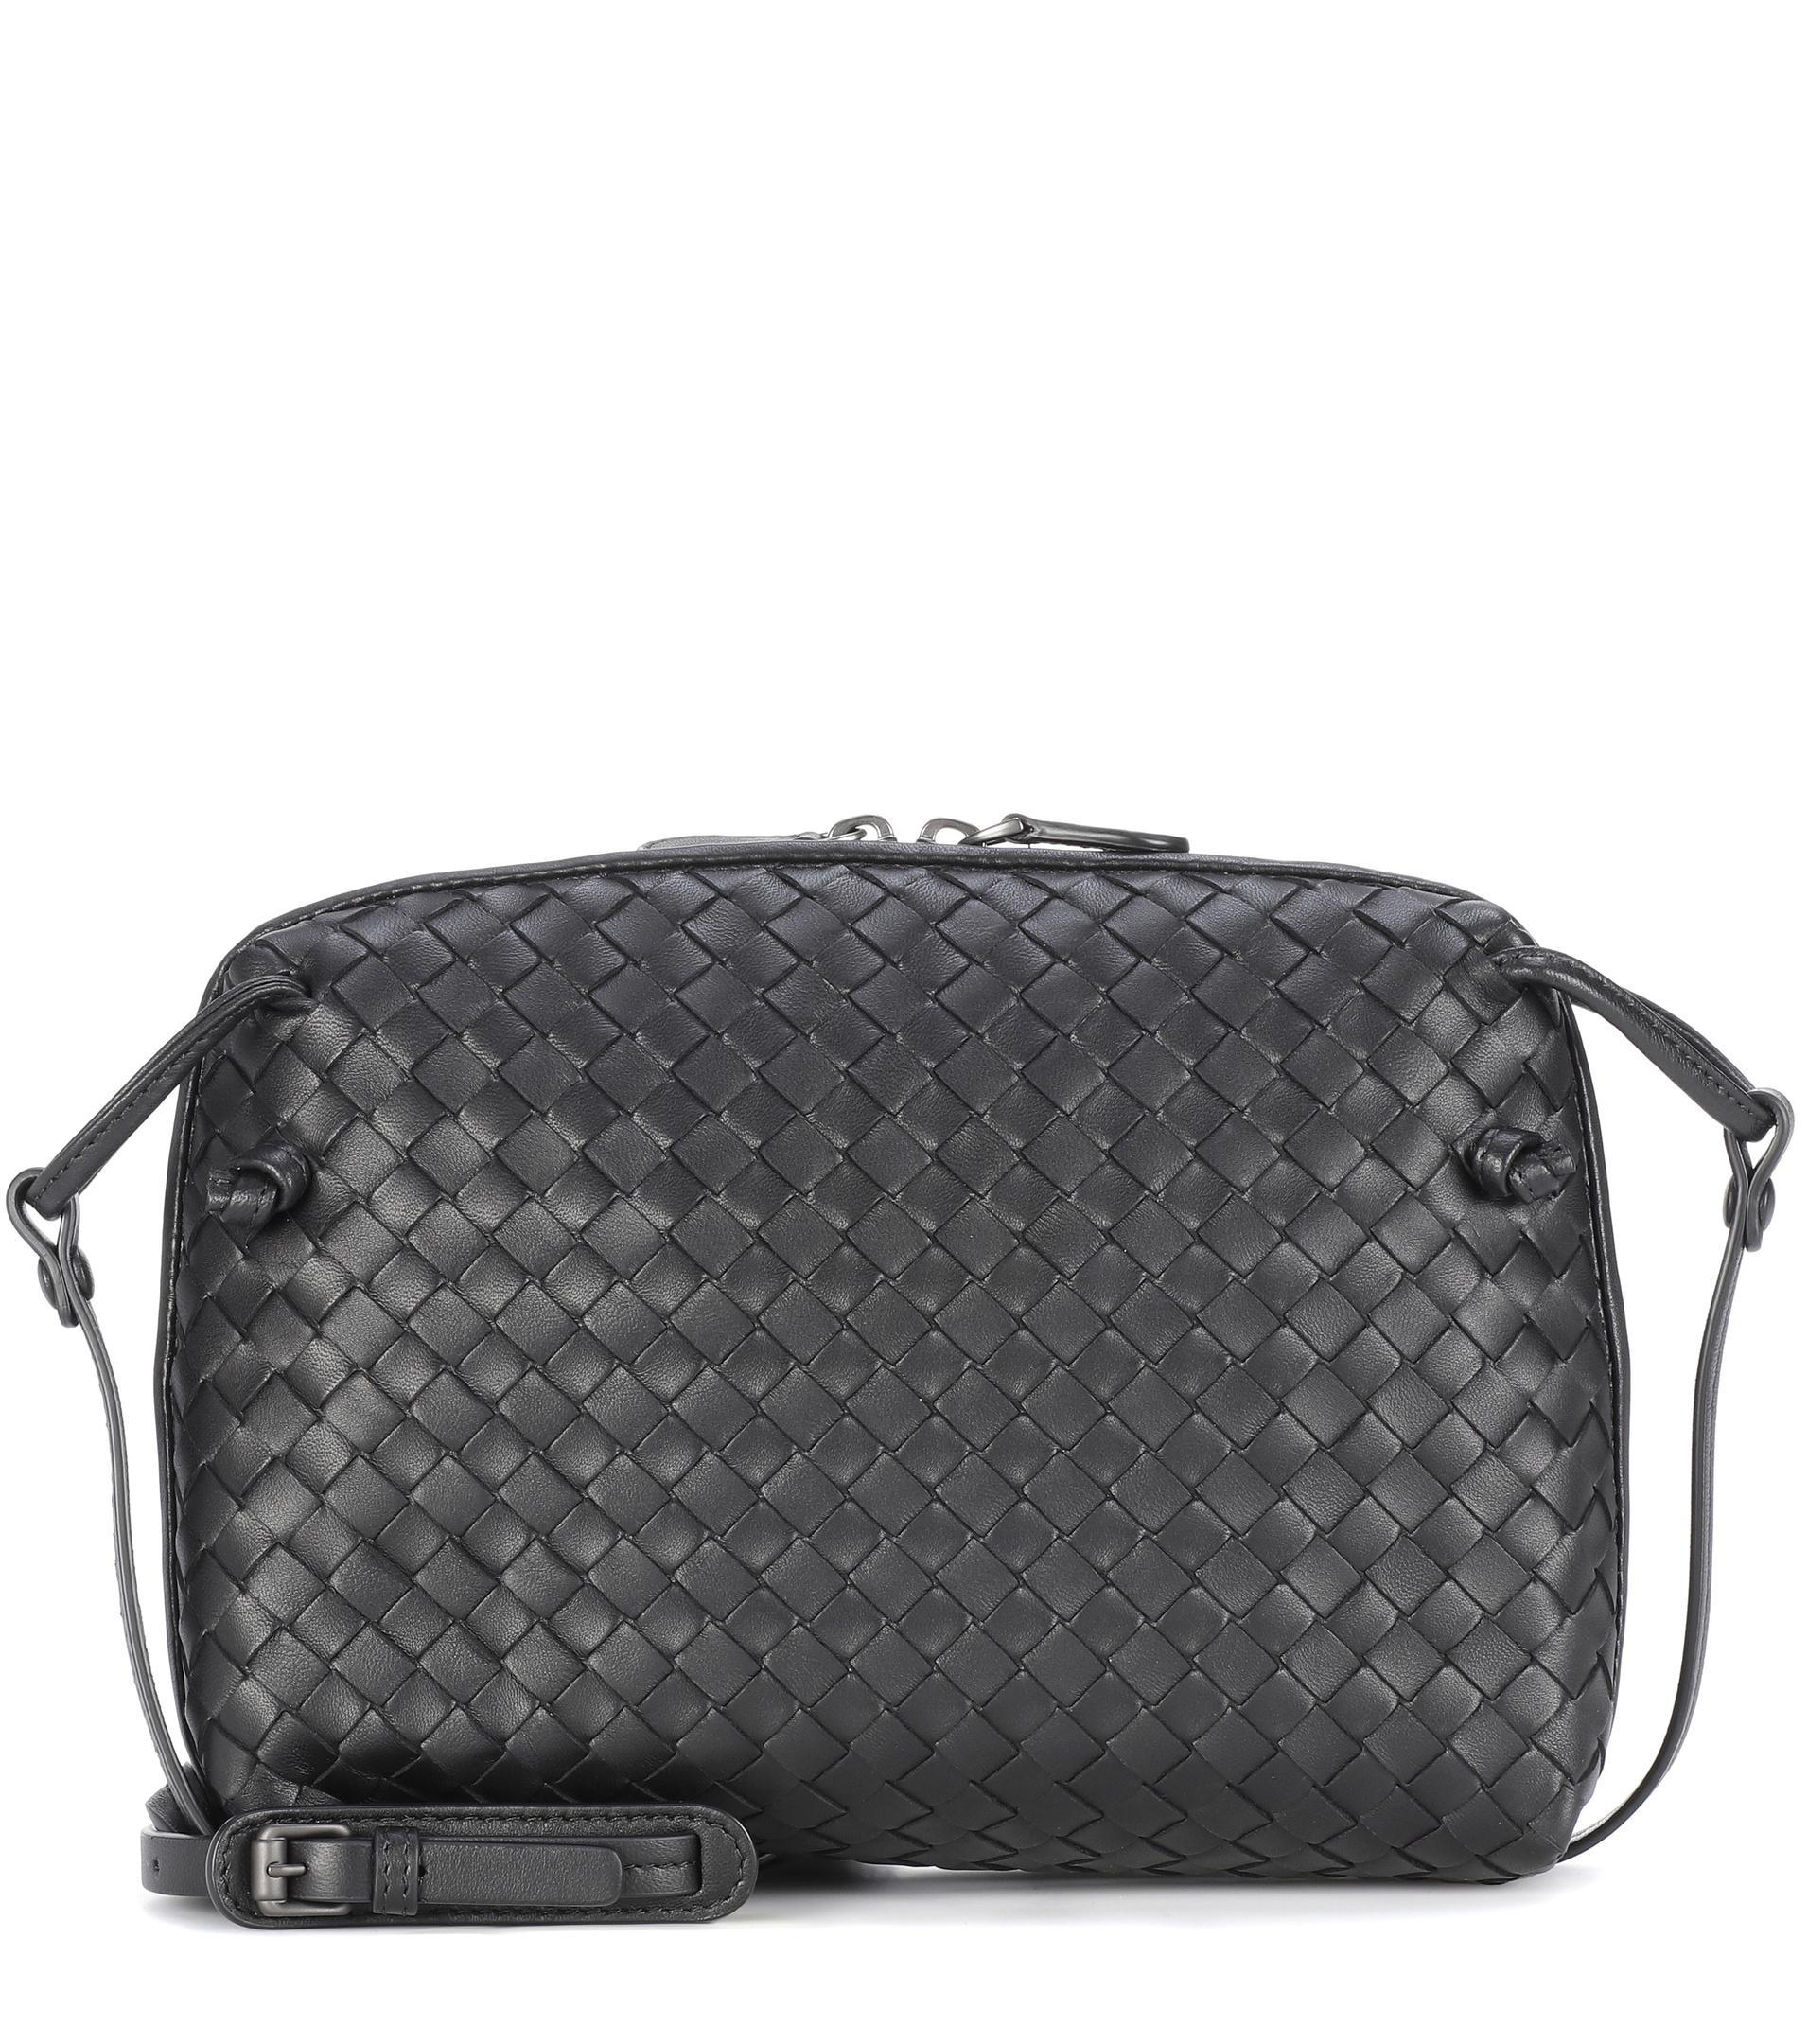 f326822024a0 Bottega Veneta Nodini Leather Crossbody Bag in Black - Lyst